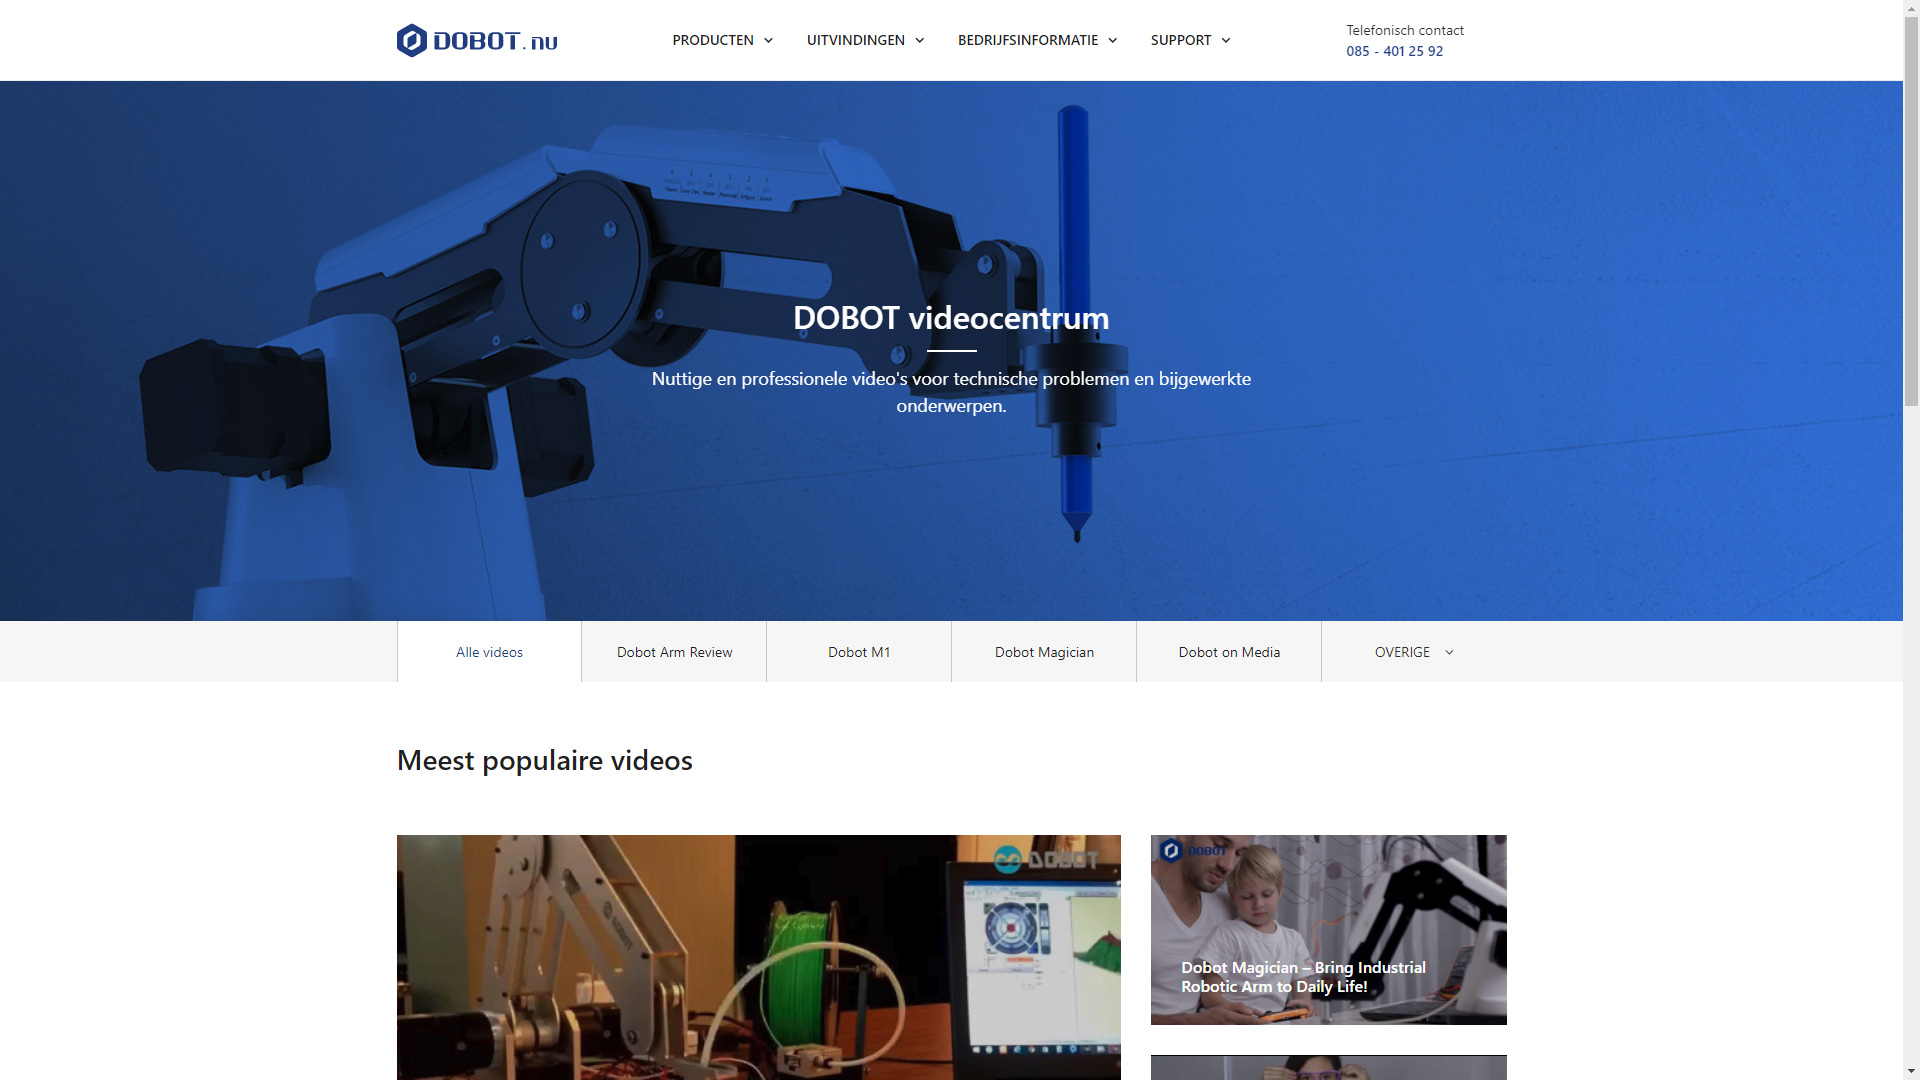 DOBOT.nu - Videocentrum